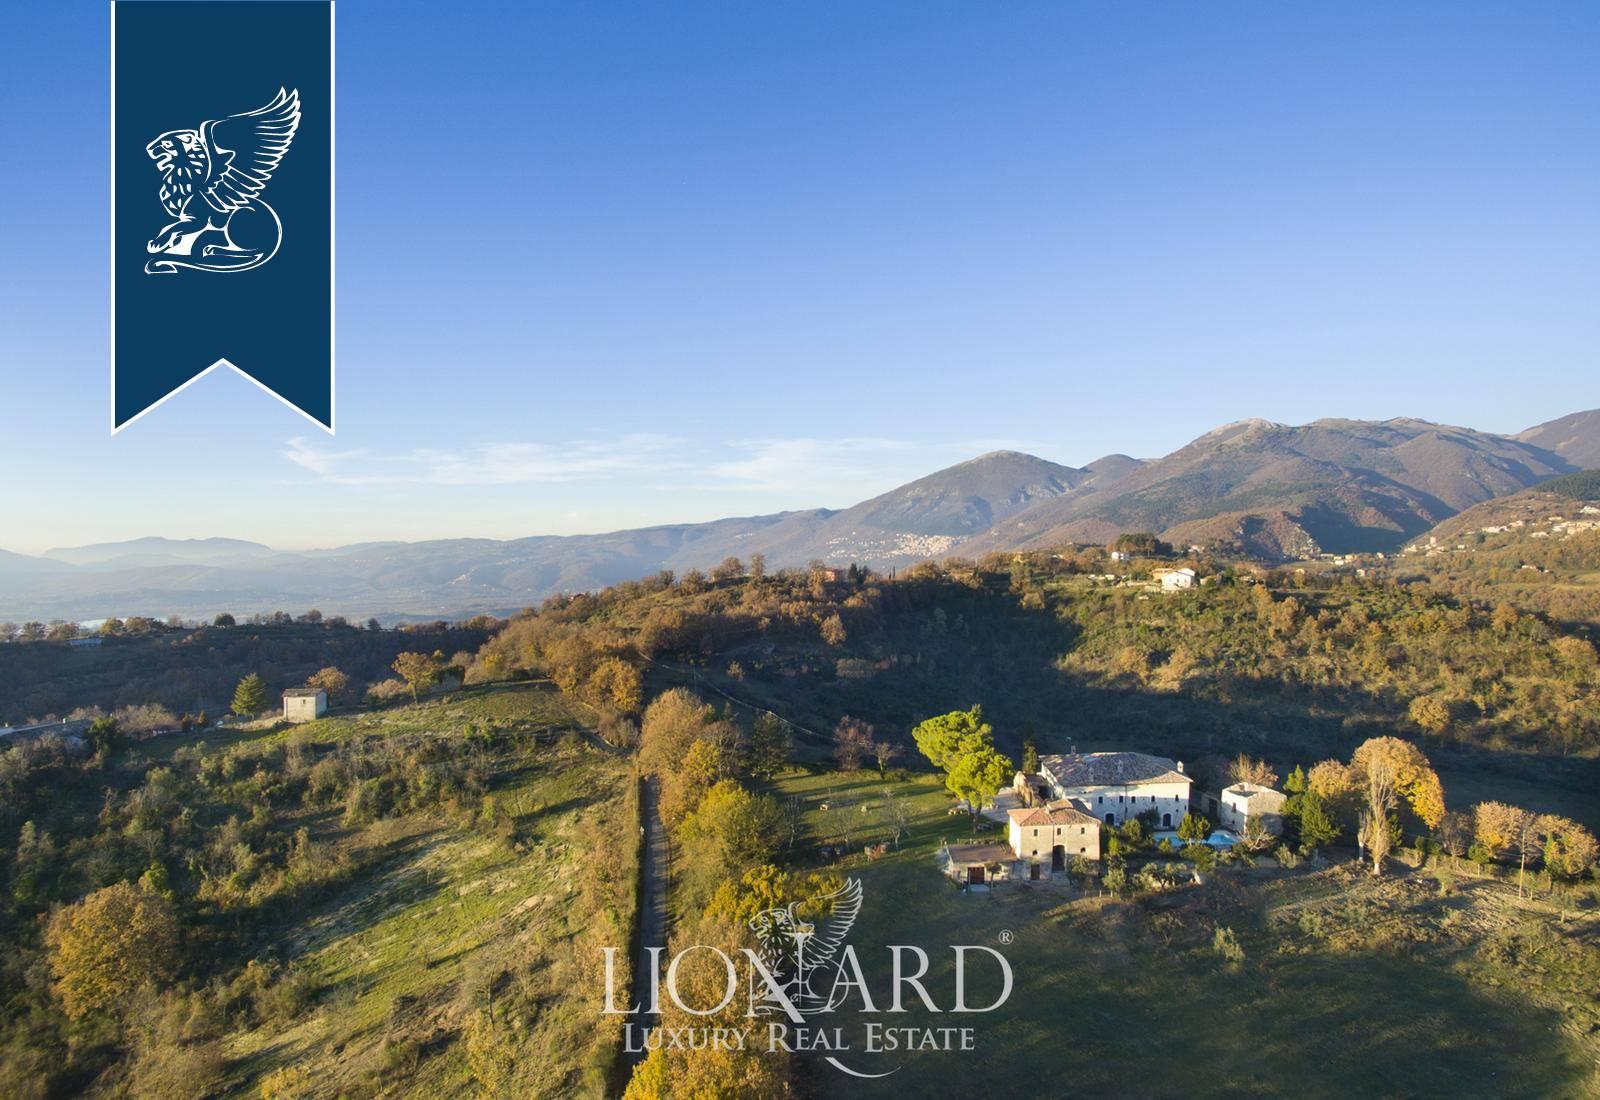 Agriturismo in Vendita a Cantalice: 0 locali, 600 mq - Foto 9